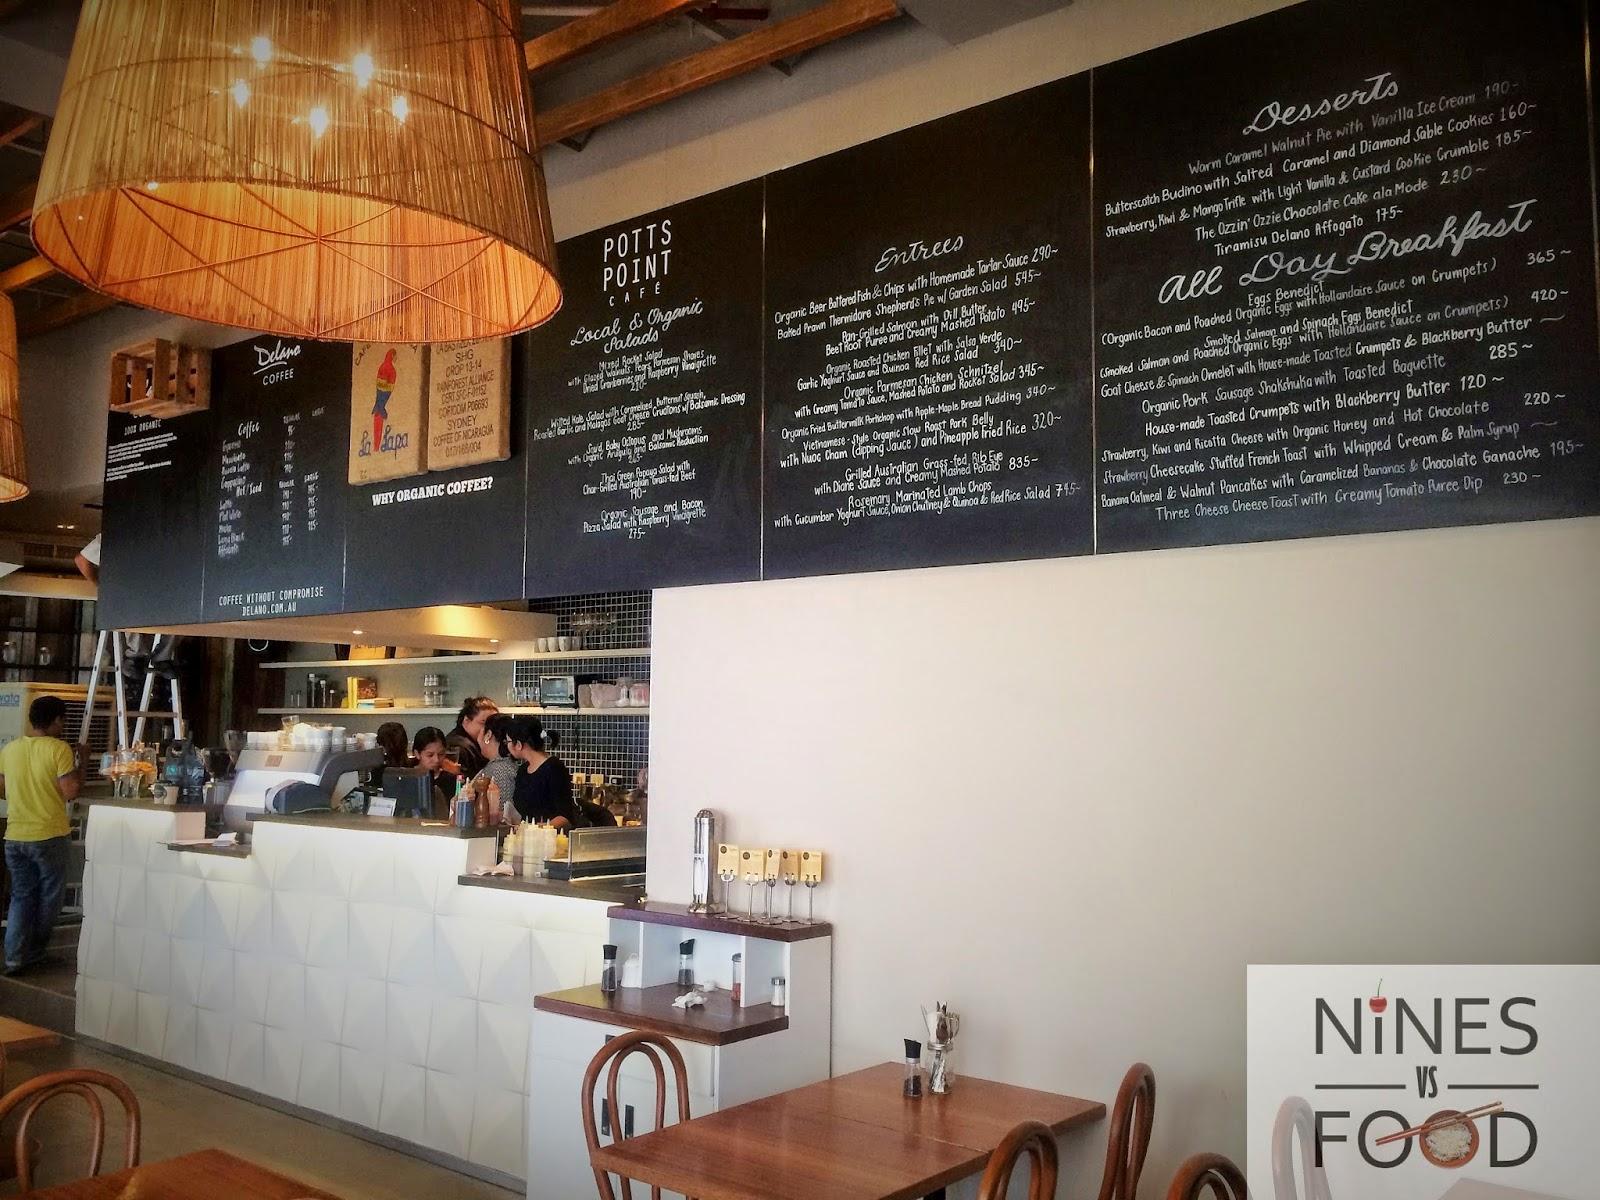 Nines vs. Food - Potts Point Cafe-3.jpg